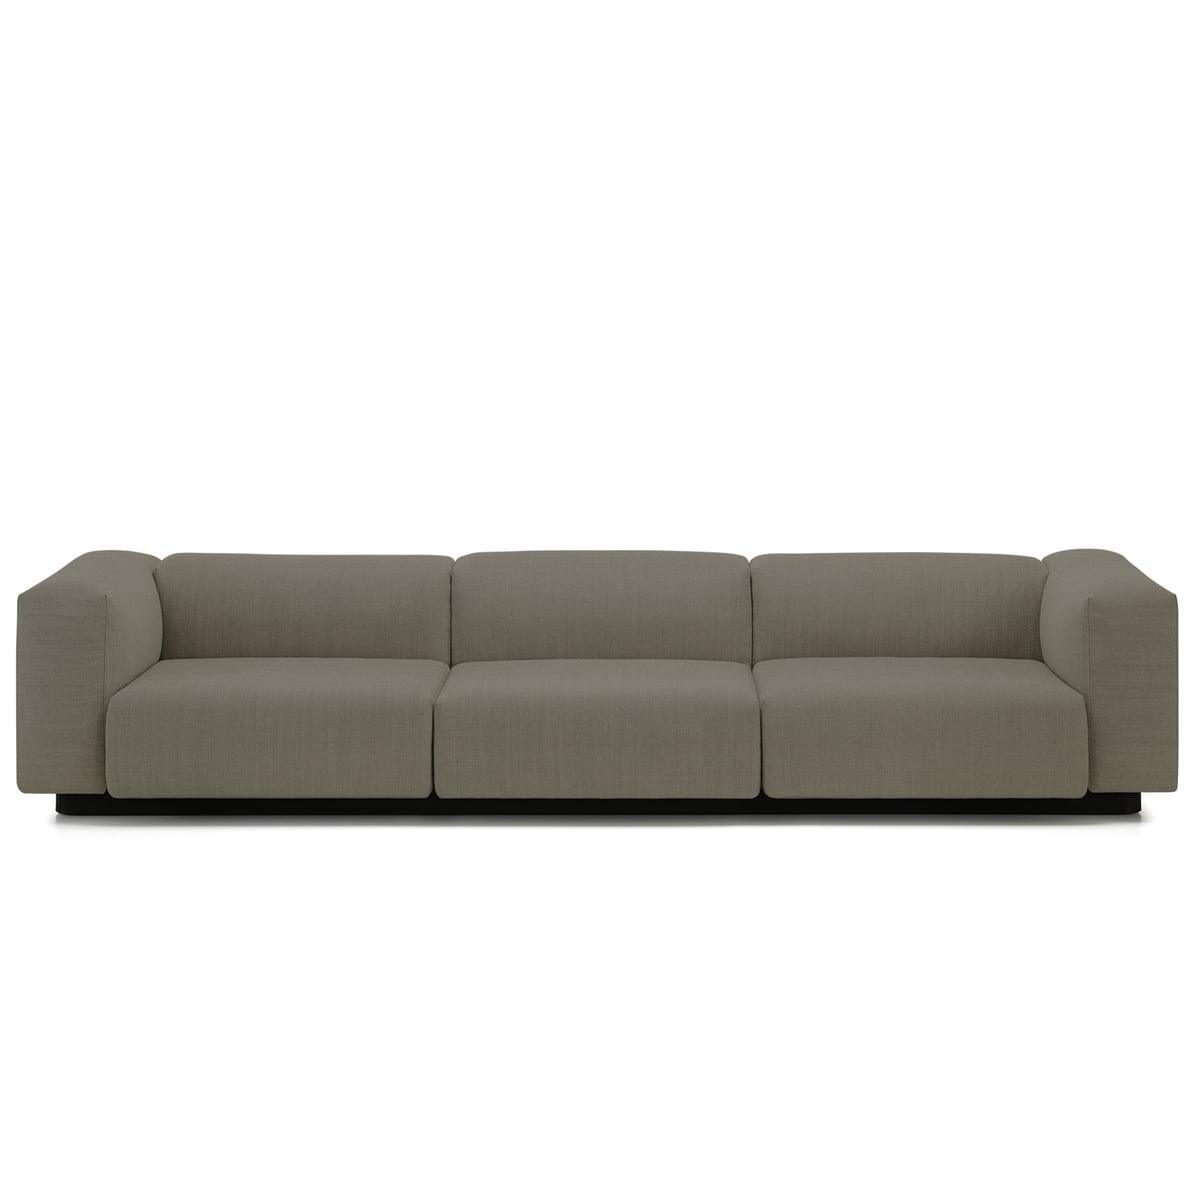 Ekstra Vitra Soft Modular 3-personers sofa i Connox Interiørshop ZF-96